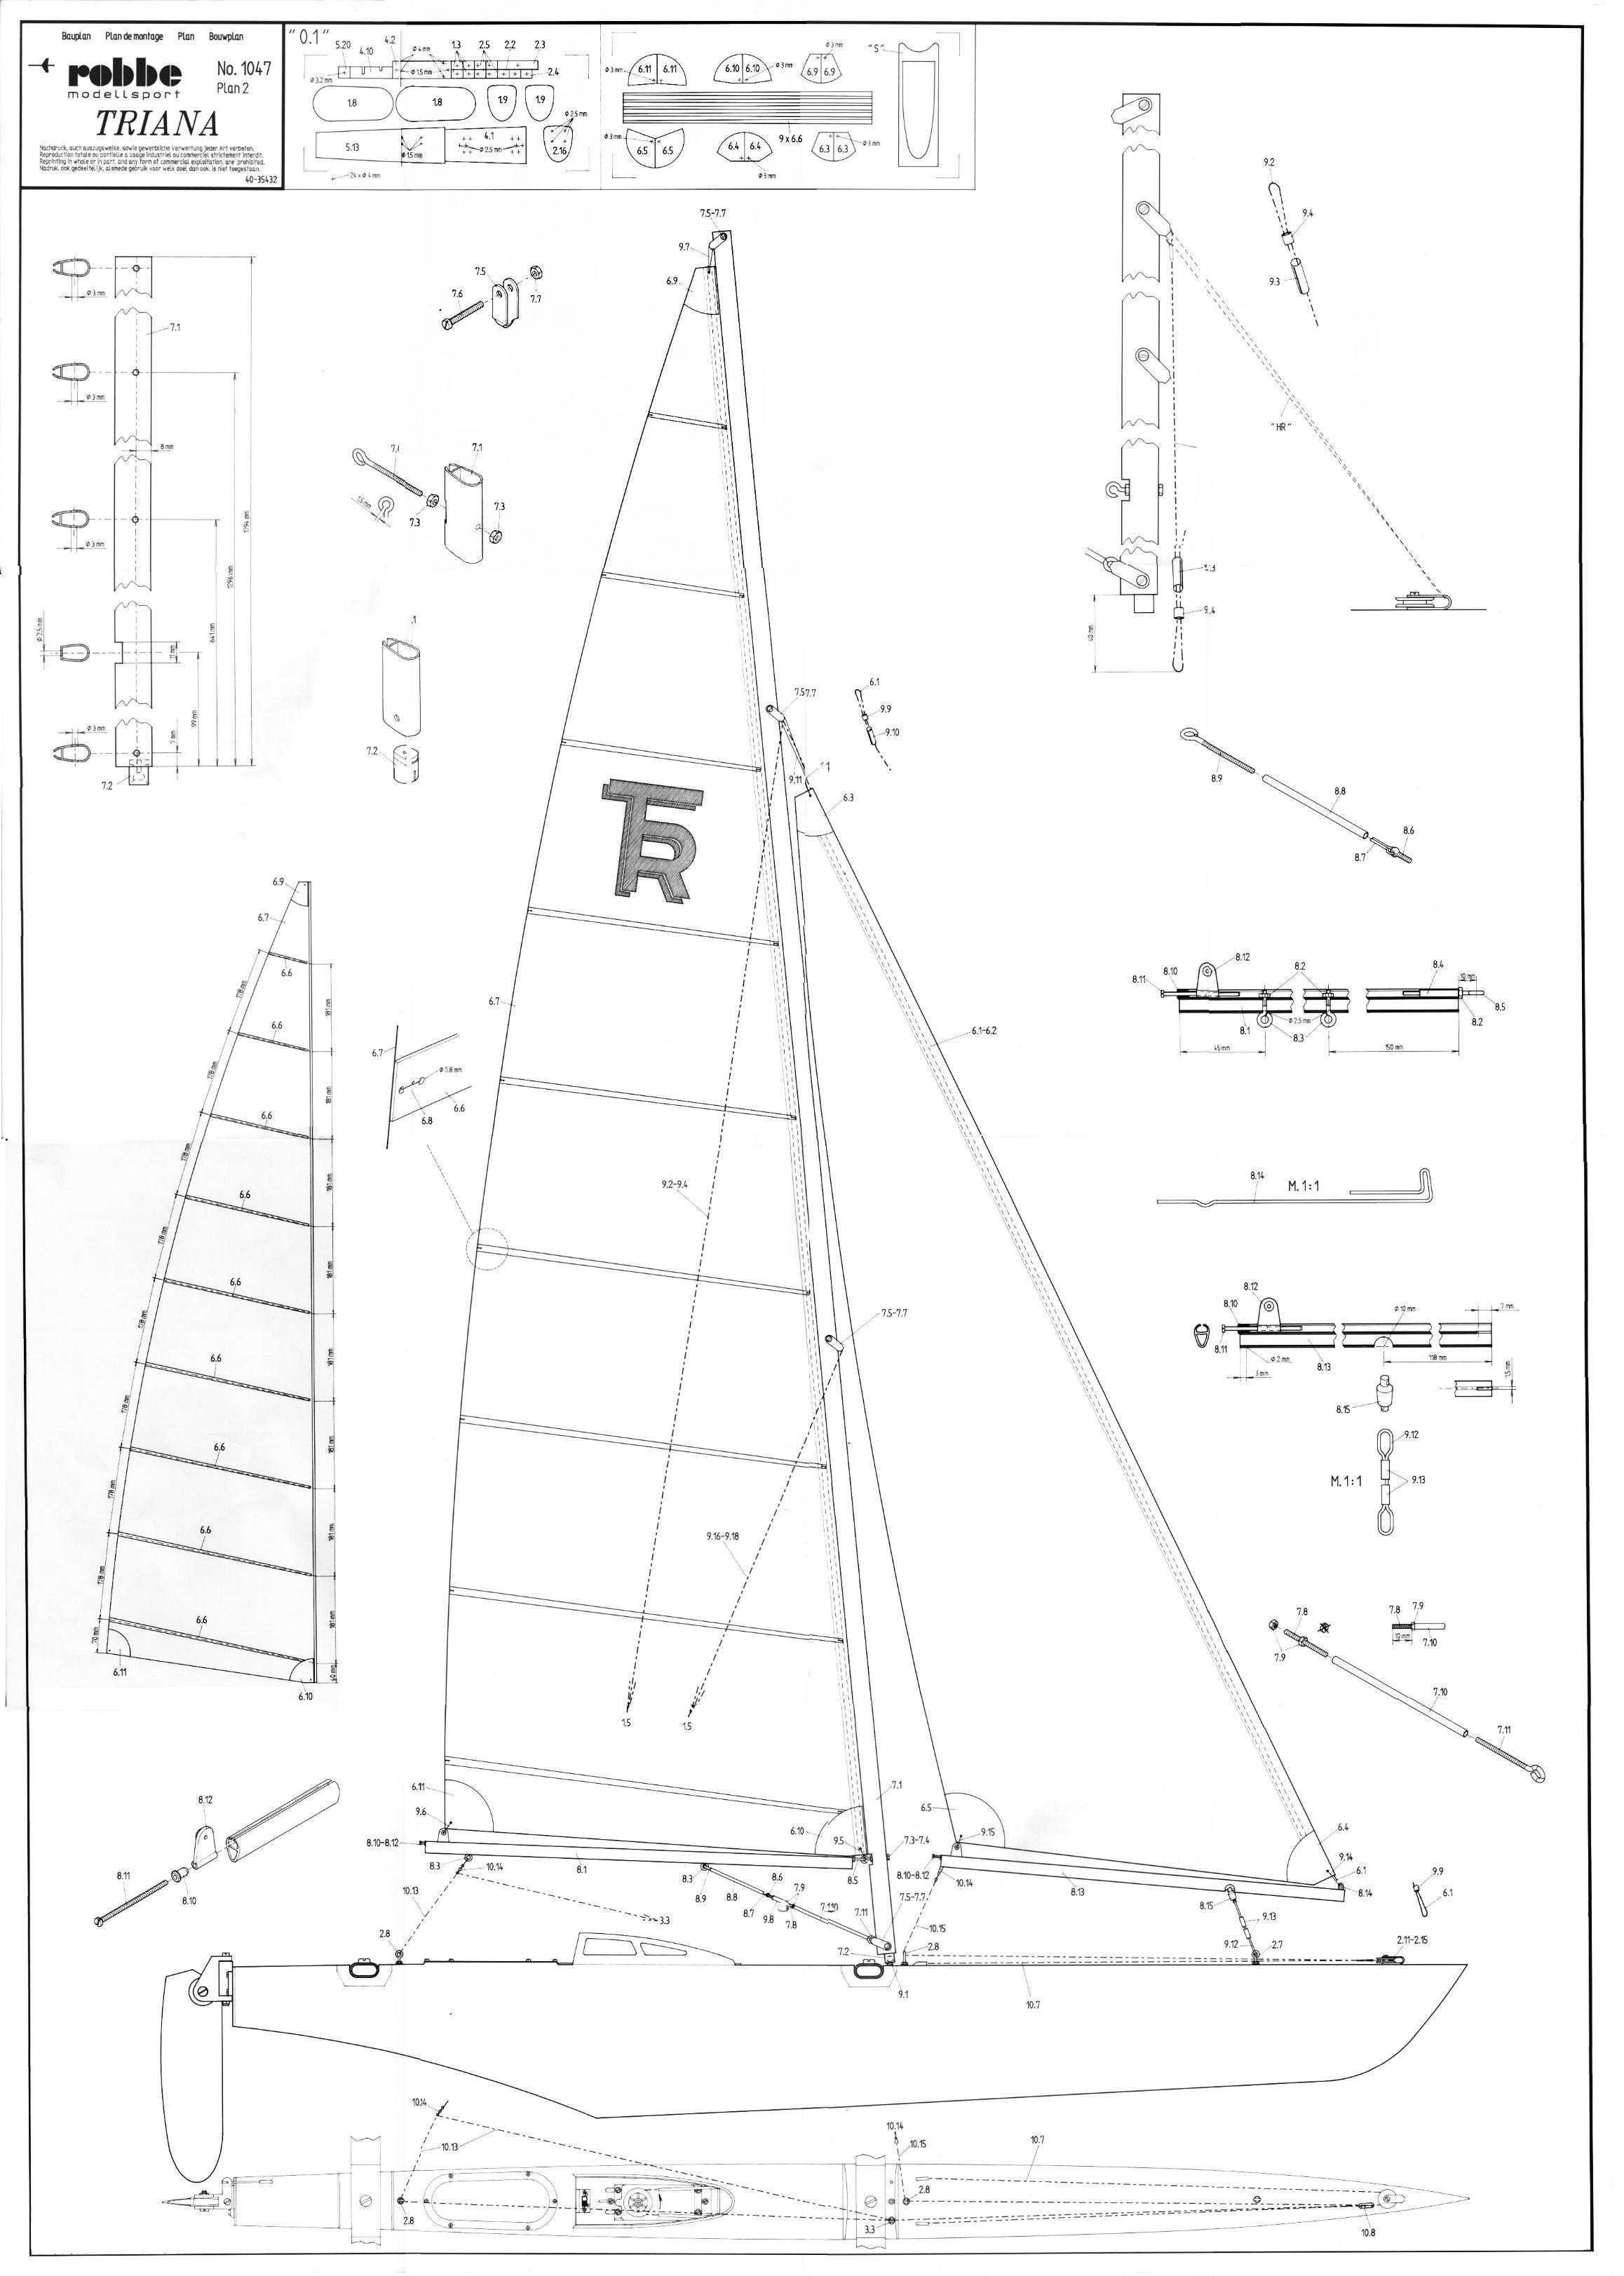 small resolution of iwema enterprise the power of rc multi hull sailing plans triana hunter sailboat diagram power sailboat diagram